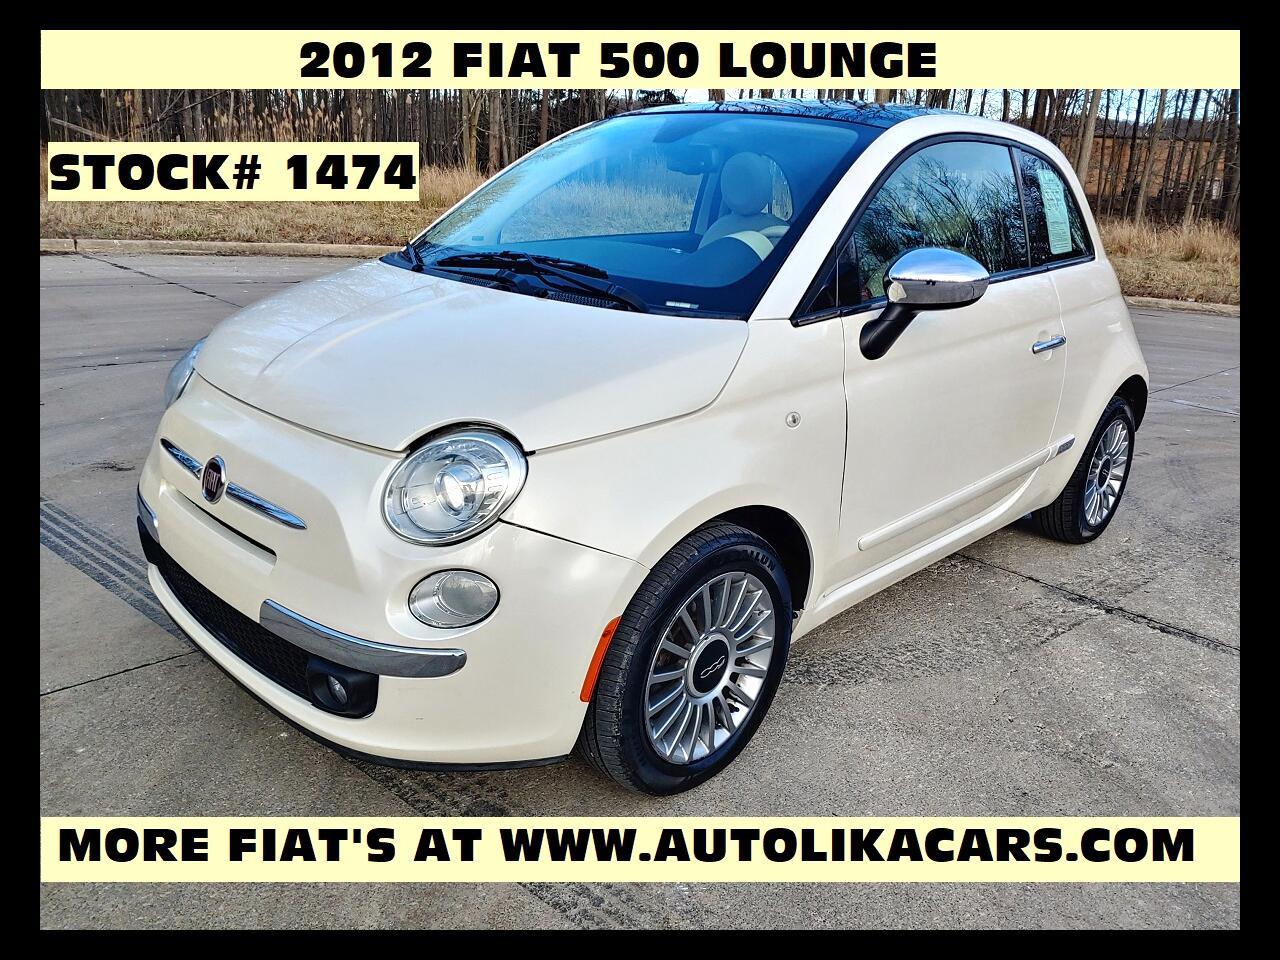 Fiat 500 2dr HB Lounge 2012